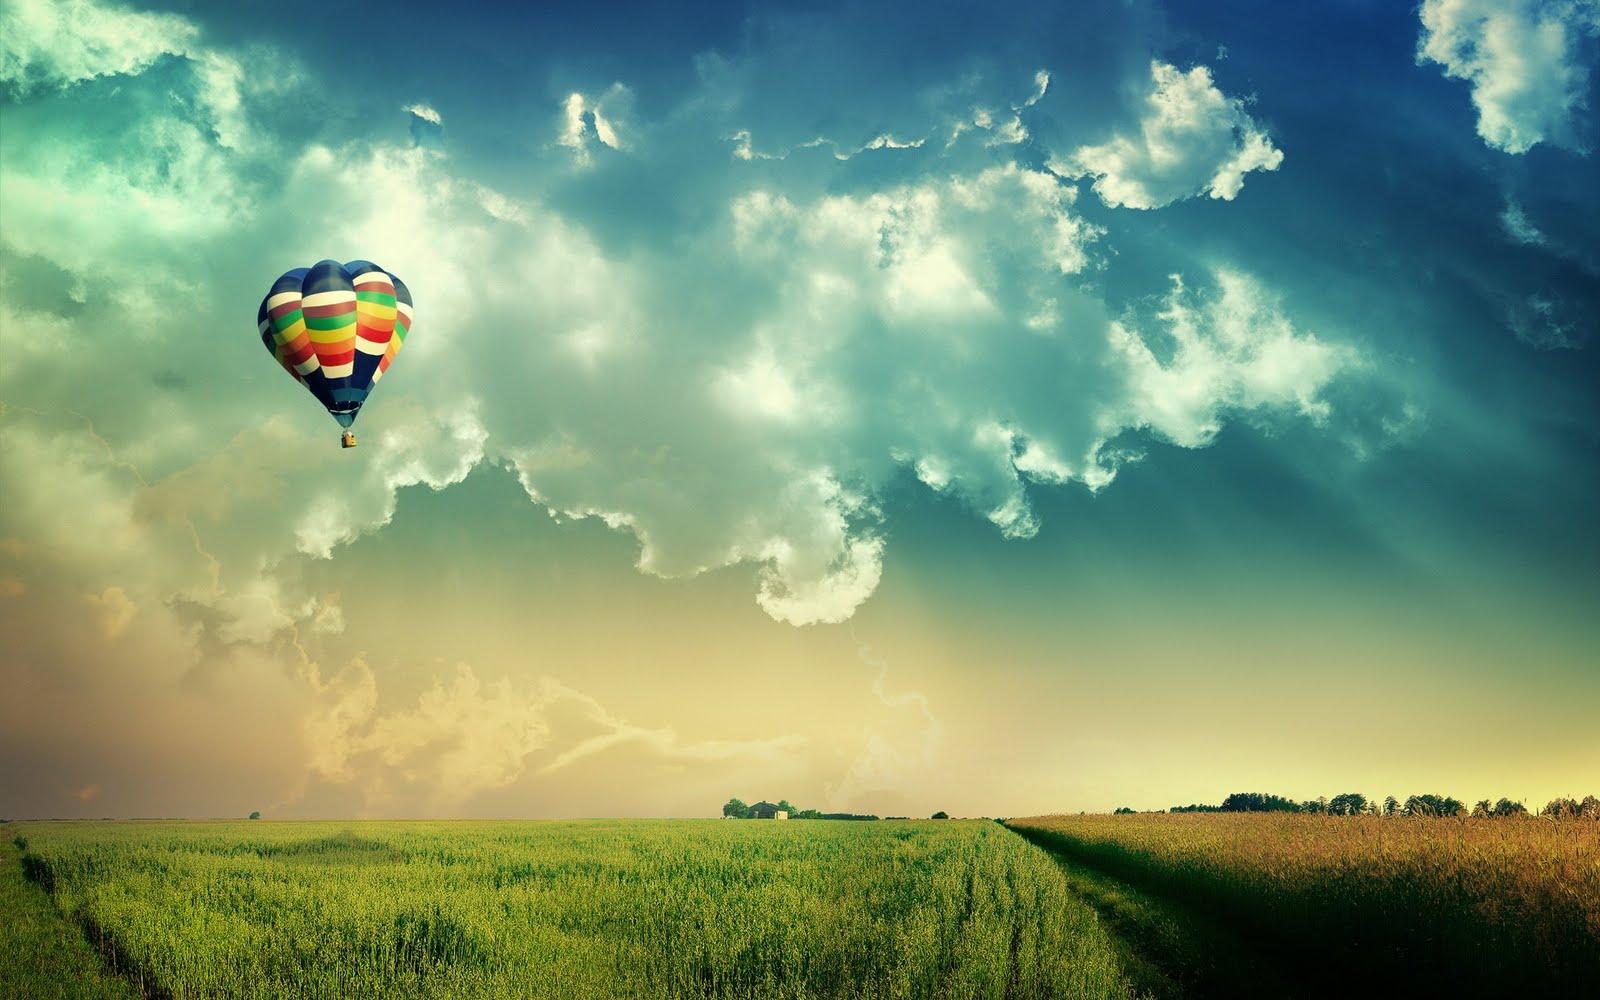 http://2.bp.blogspot.com/-InWqx5J_fpo/Td6VDb1MApI/AAAAAAAAAUc/JxInUzjYpck/s1600/Fantasy_landscape_holland_dream.jpg